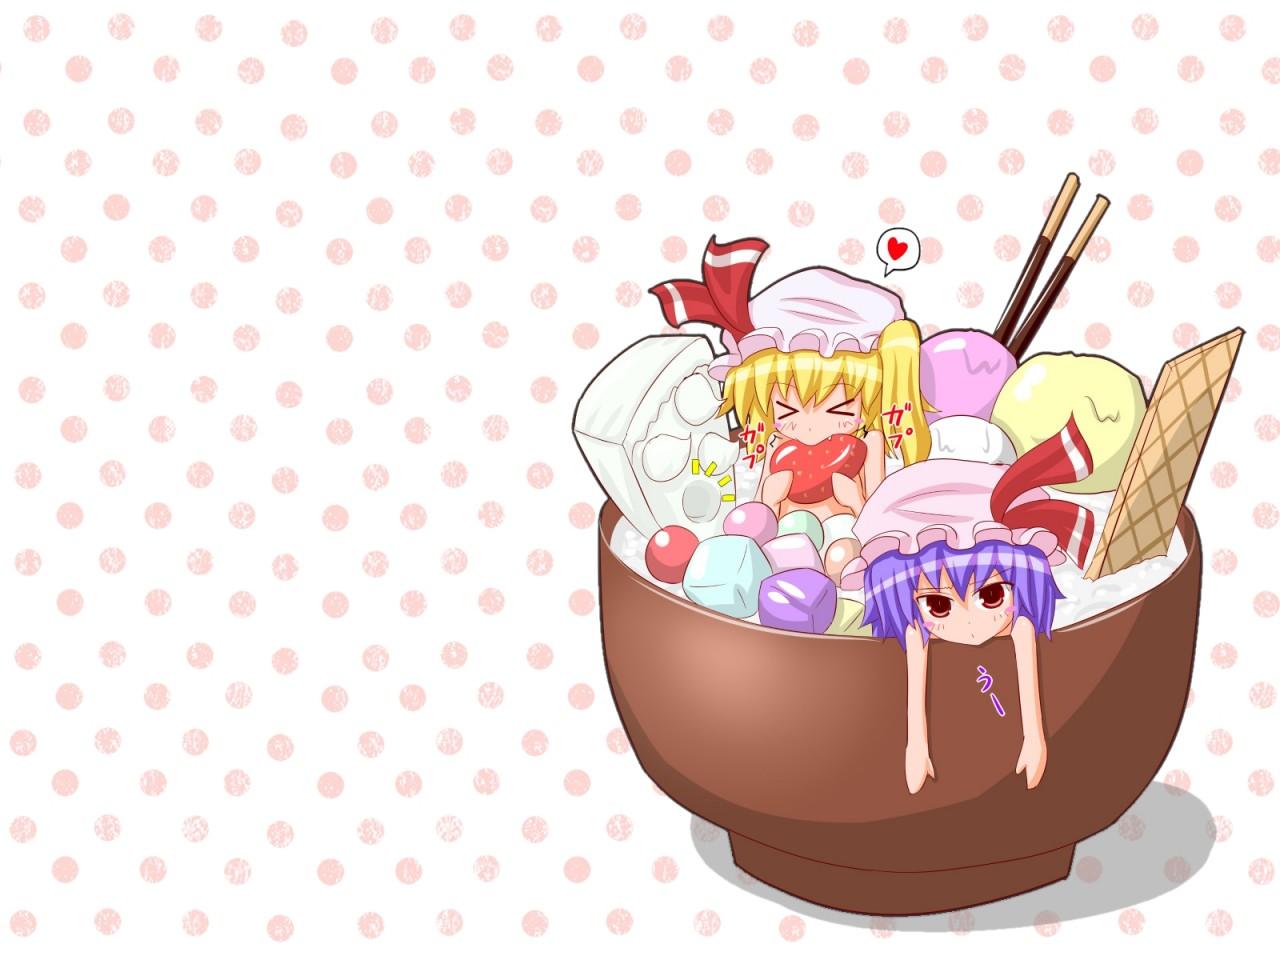 touhou_remilia_scarlet_flandre_scarlet_anime_girls_sweets_fatigue_32201_1280x960.jpg